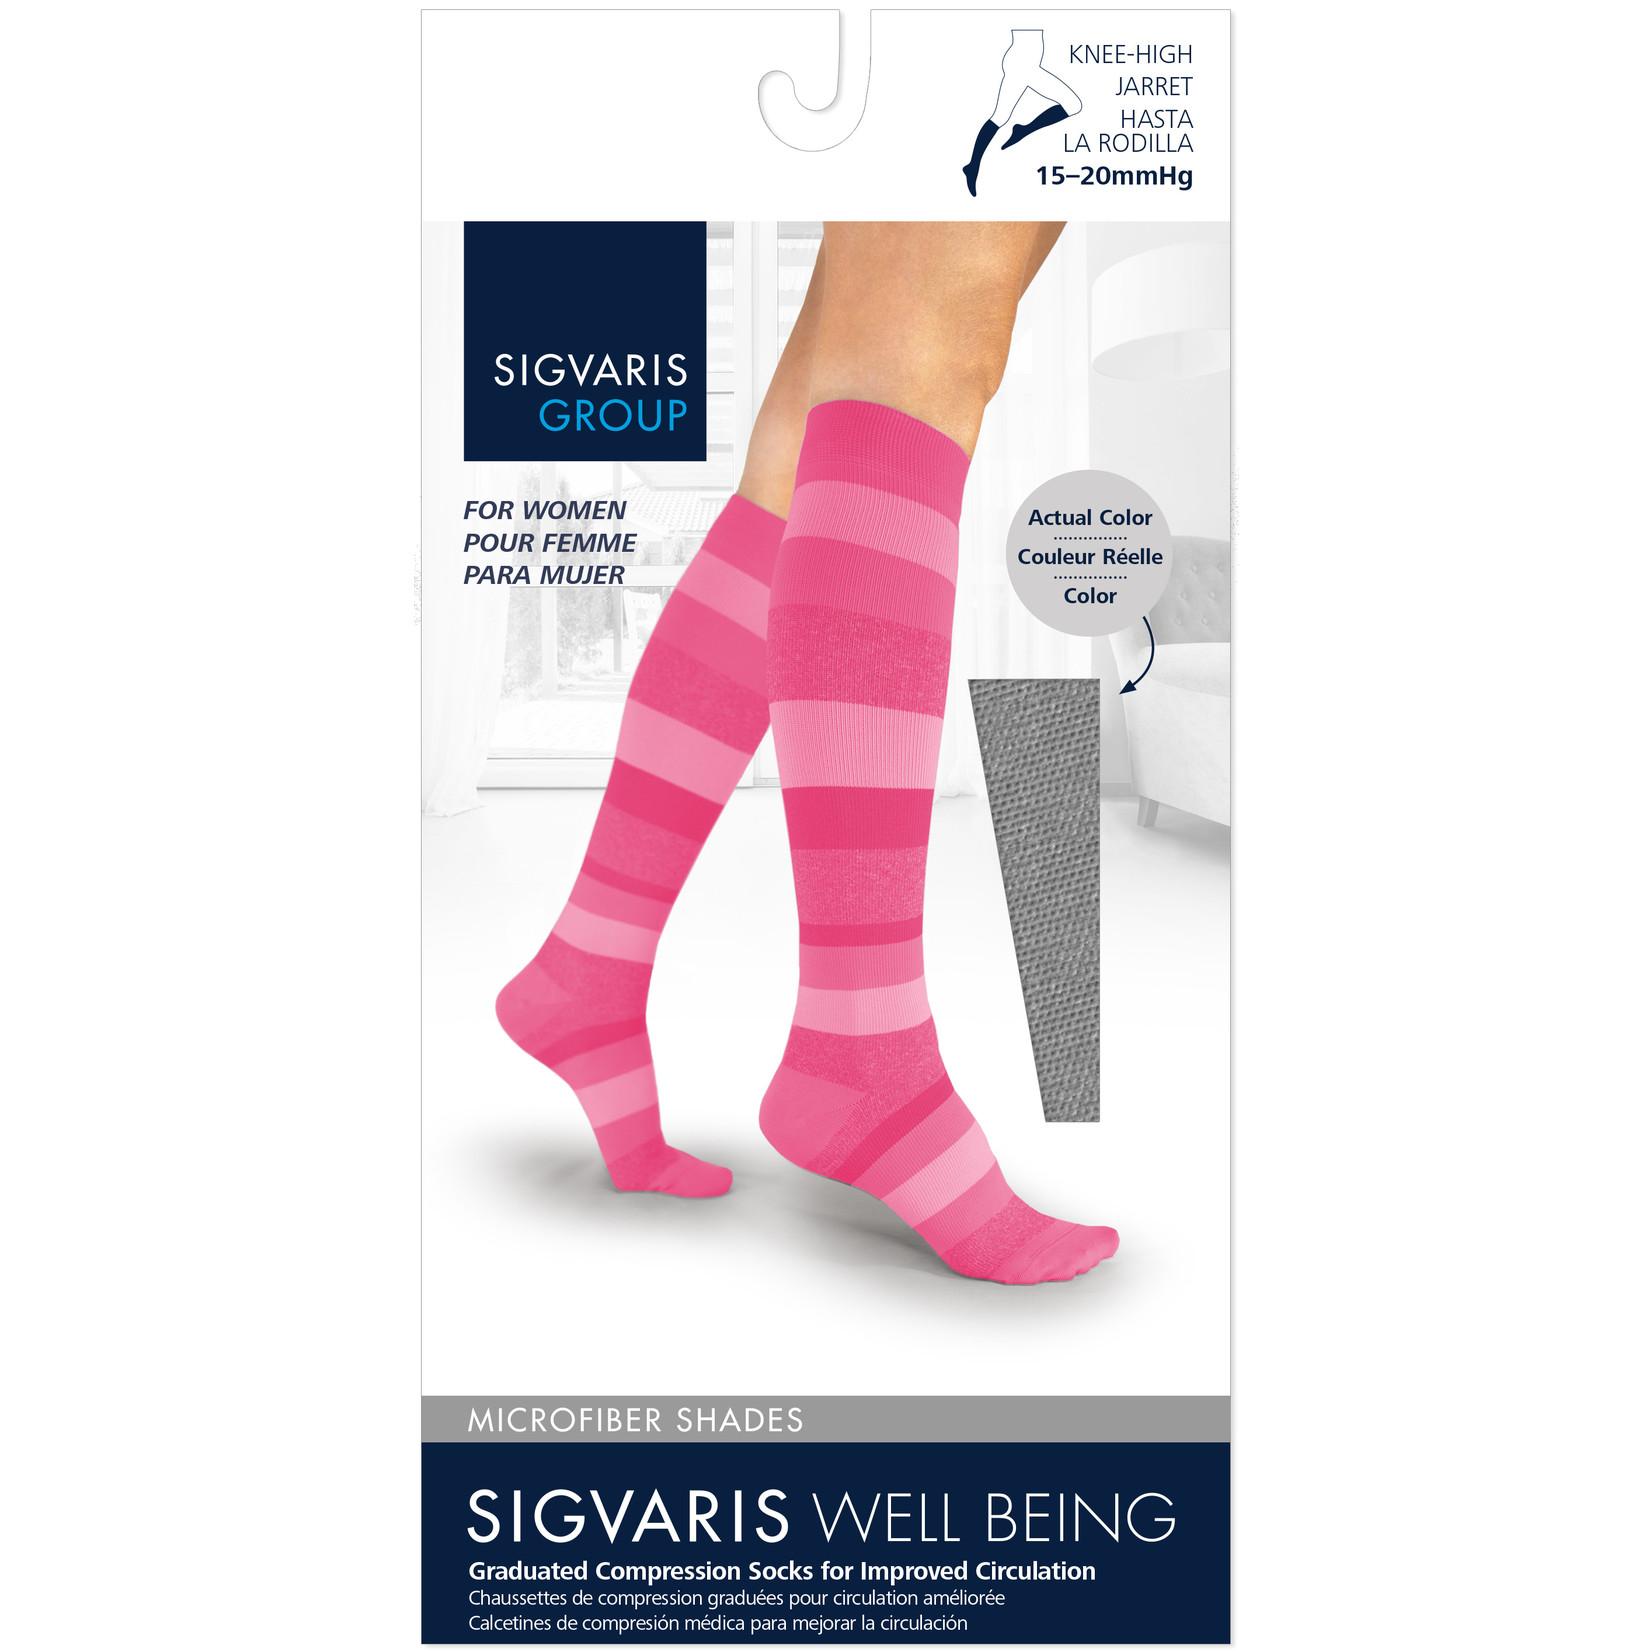 SIGVARIS Women's Microfiber Shades Calf 15-20mmHg